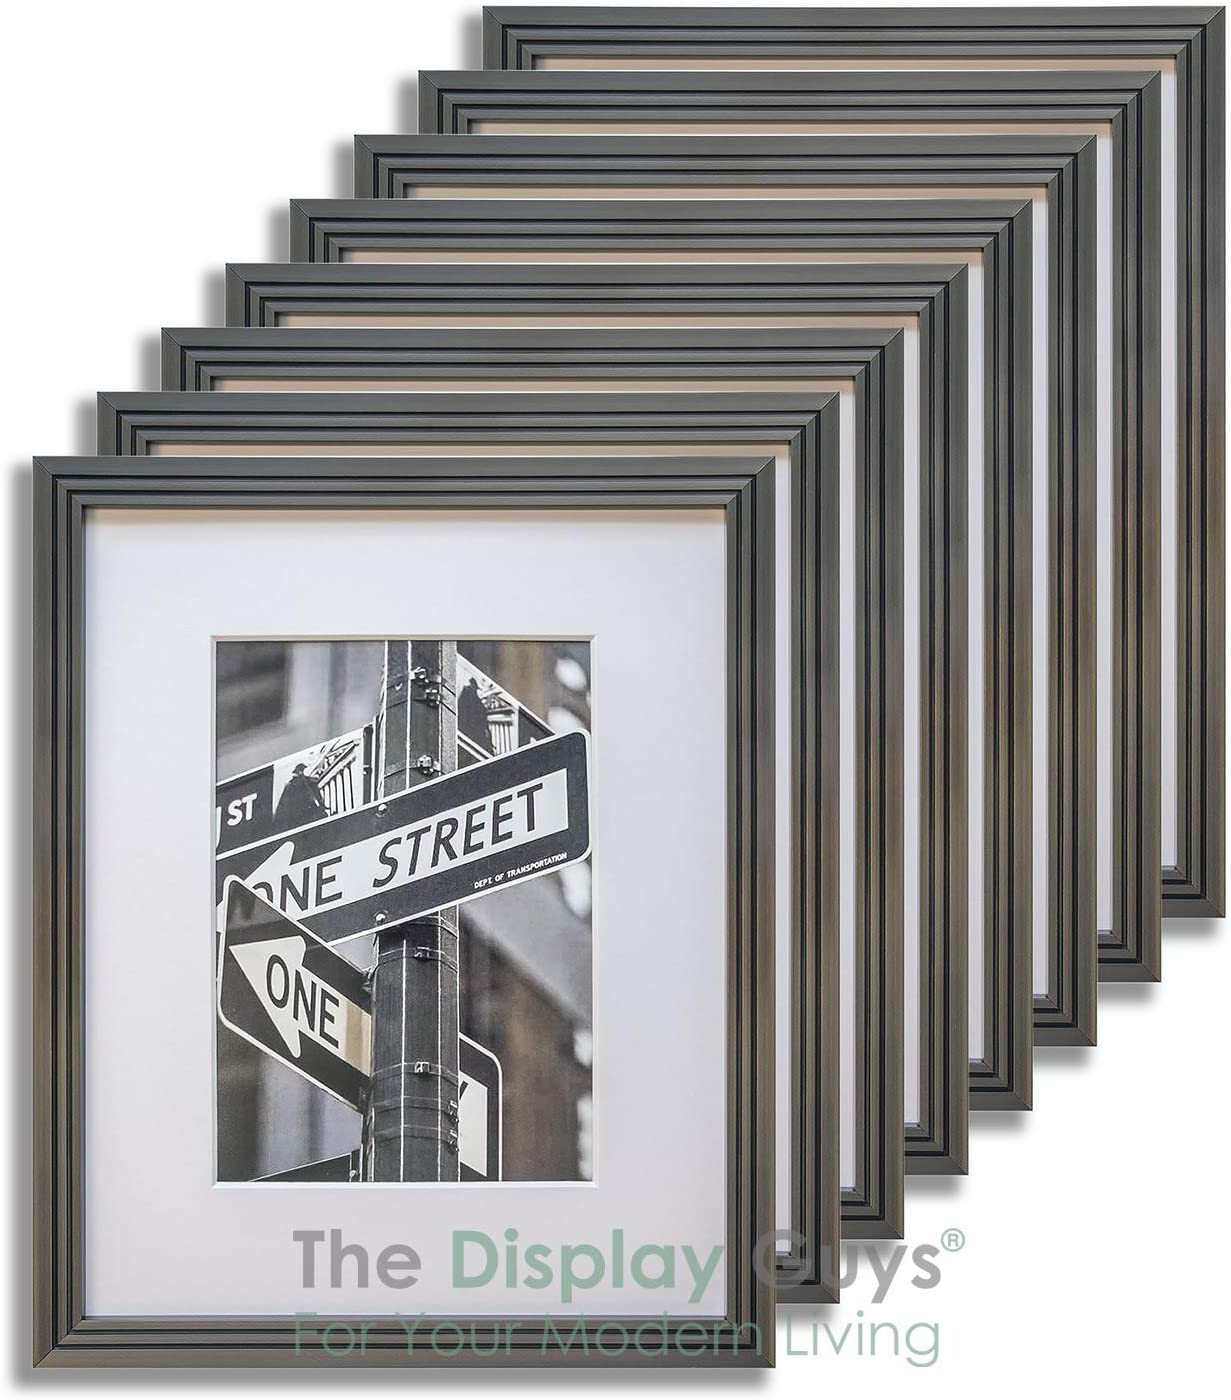 "The Display Guys 5x7 Steel Grey (Gunmetal) Art Deco Picture Frames w. Mat for 4x6 (Value 8-Pack), Plexiglass 5/8"" Thin Border"